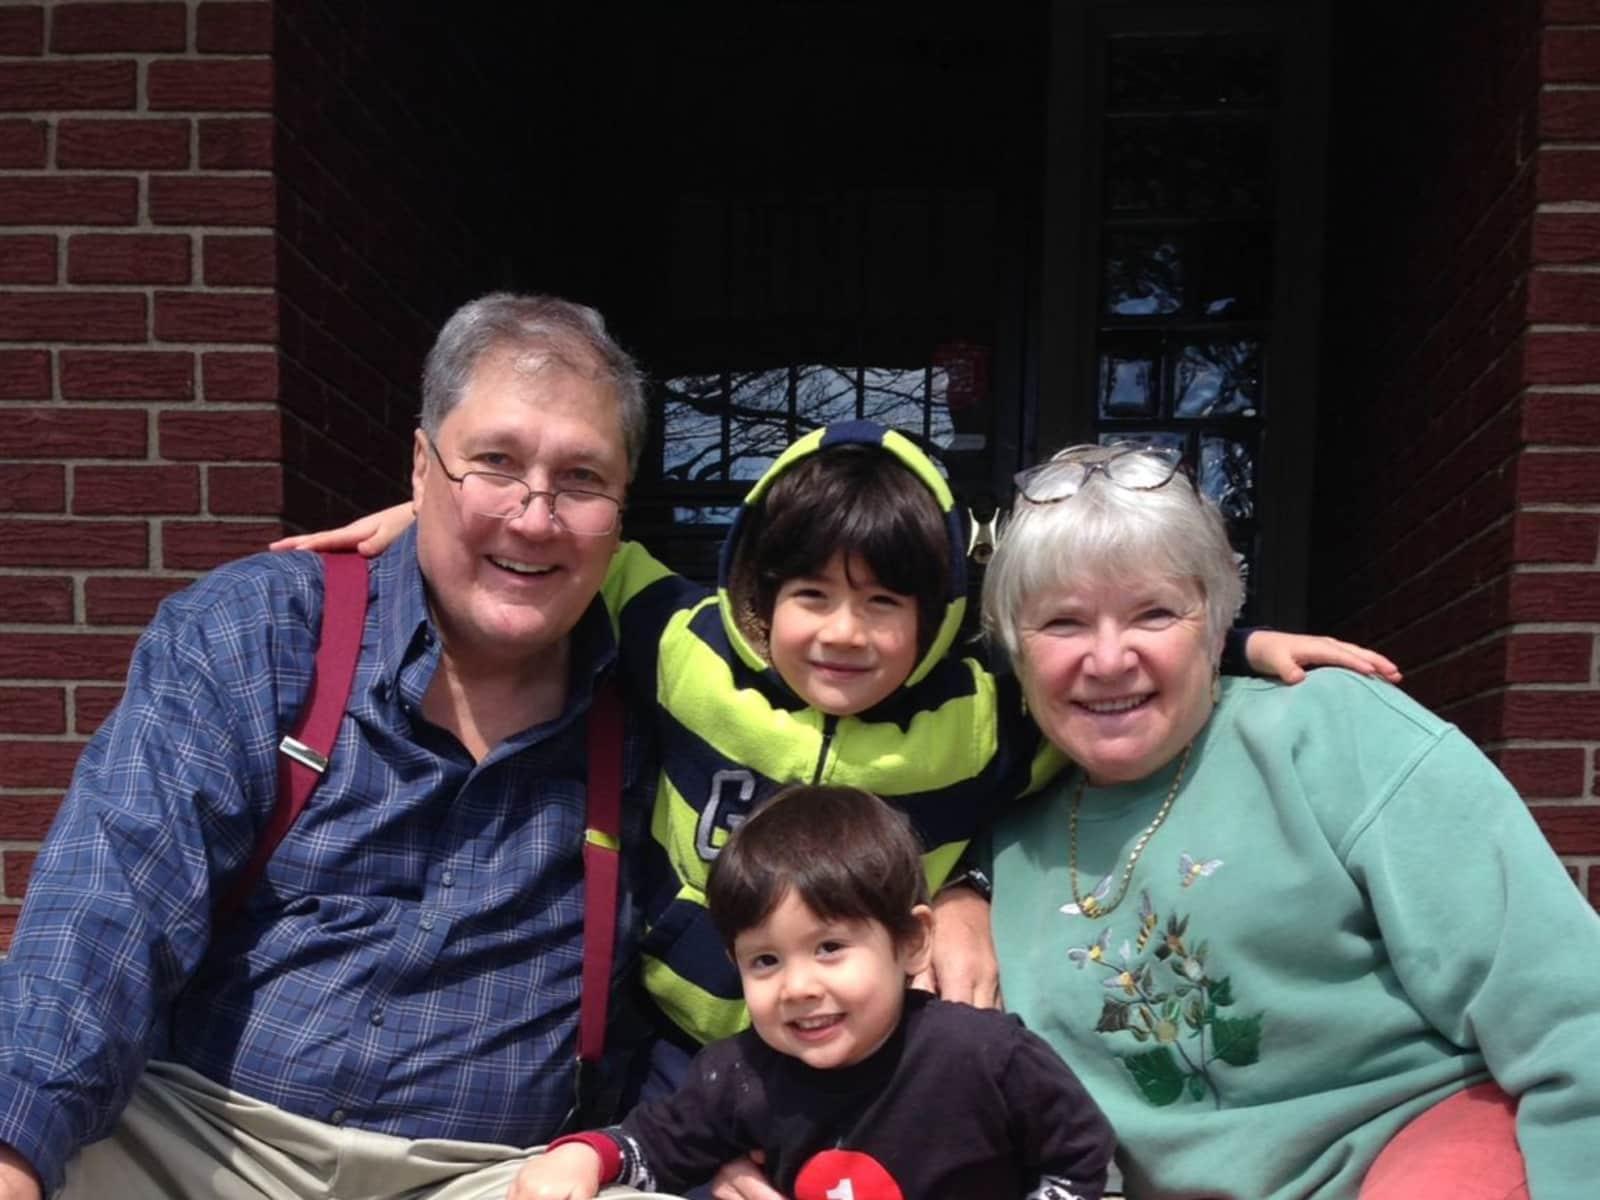 Richard & Susan from Columbus, Ohio, United States